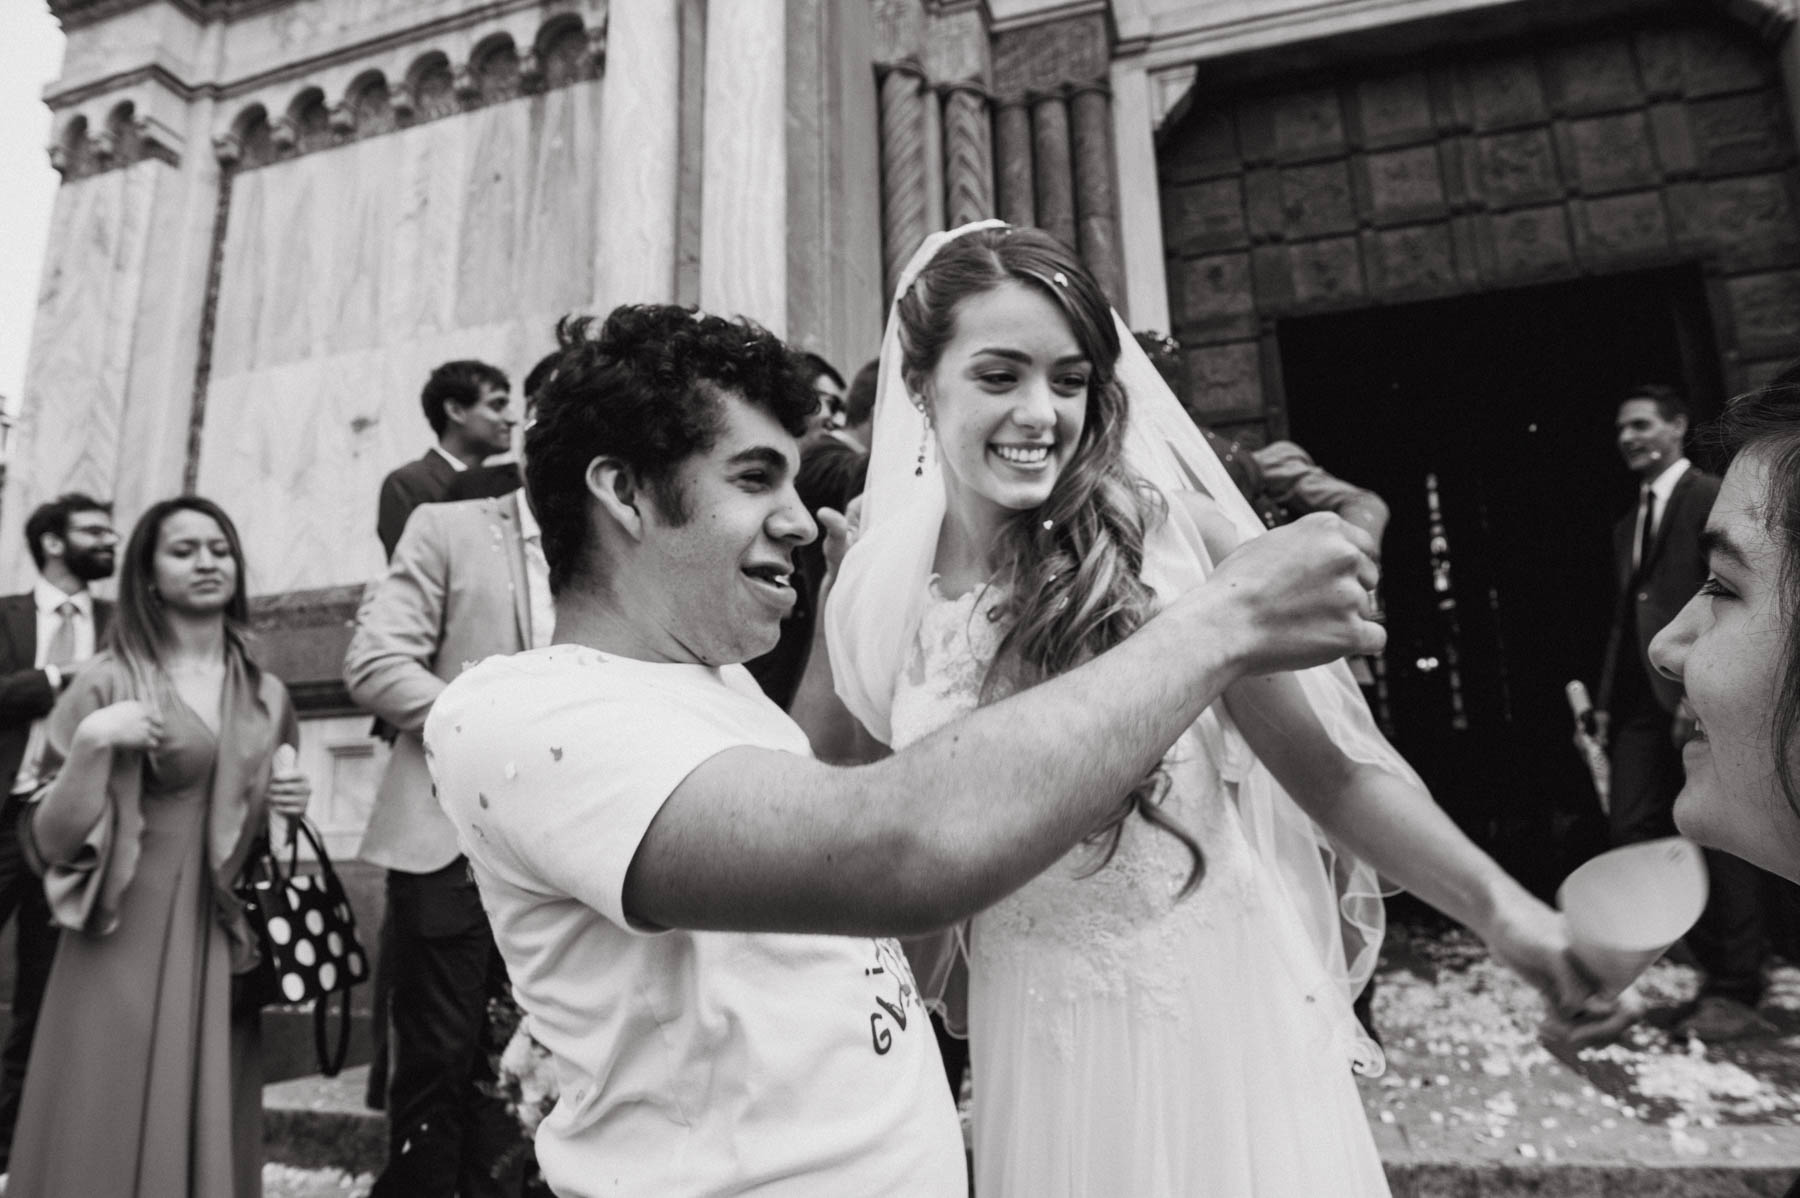 stefano torreggiani phototeam-fotografo-matrimonio- (11).jpg